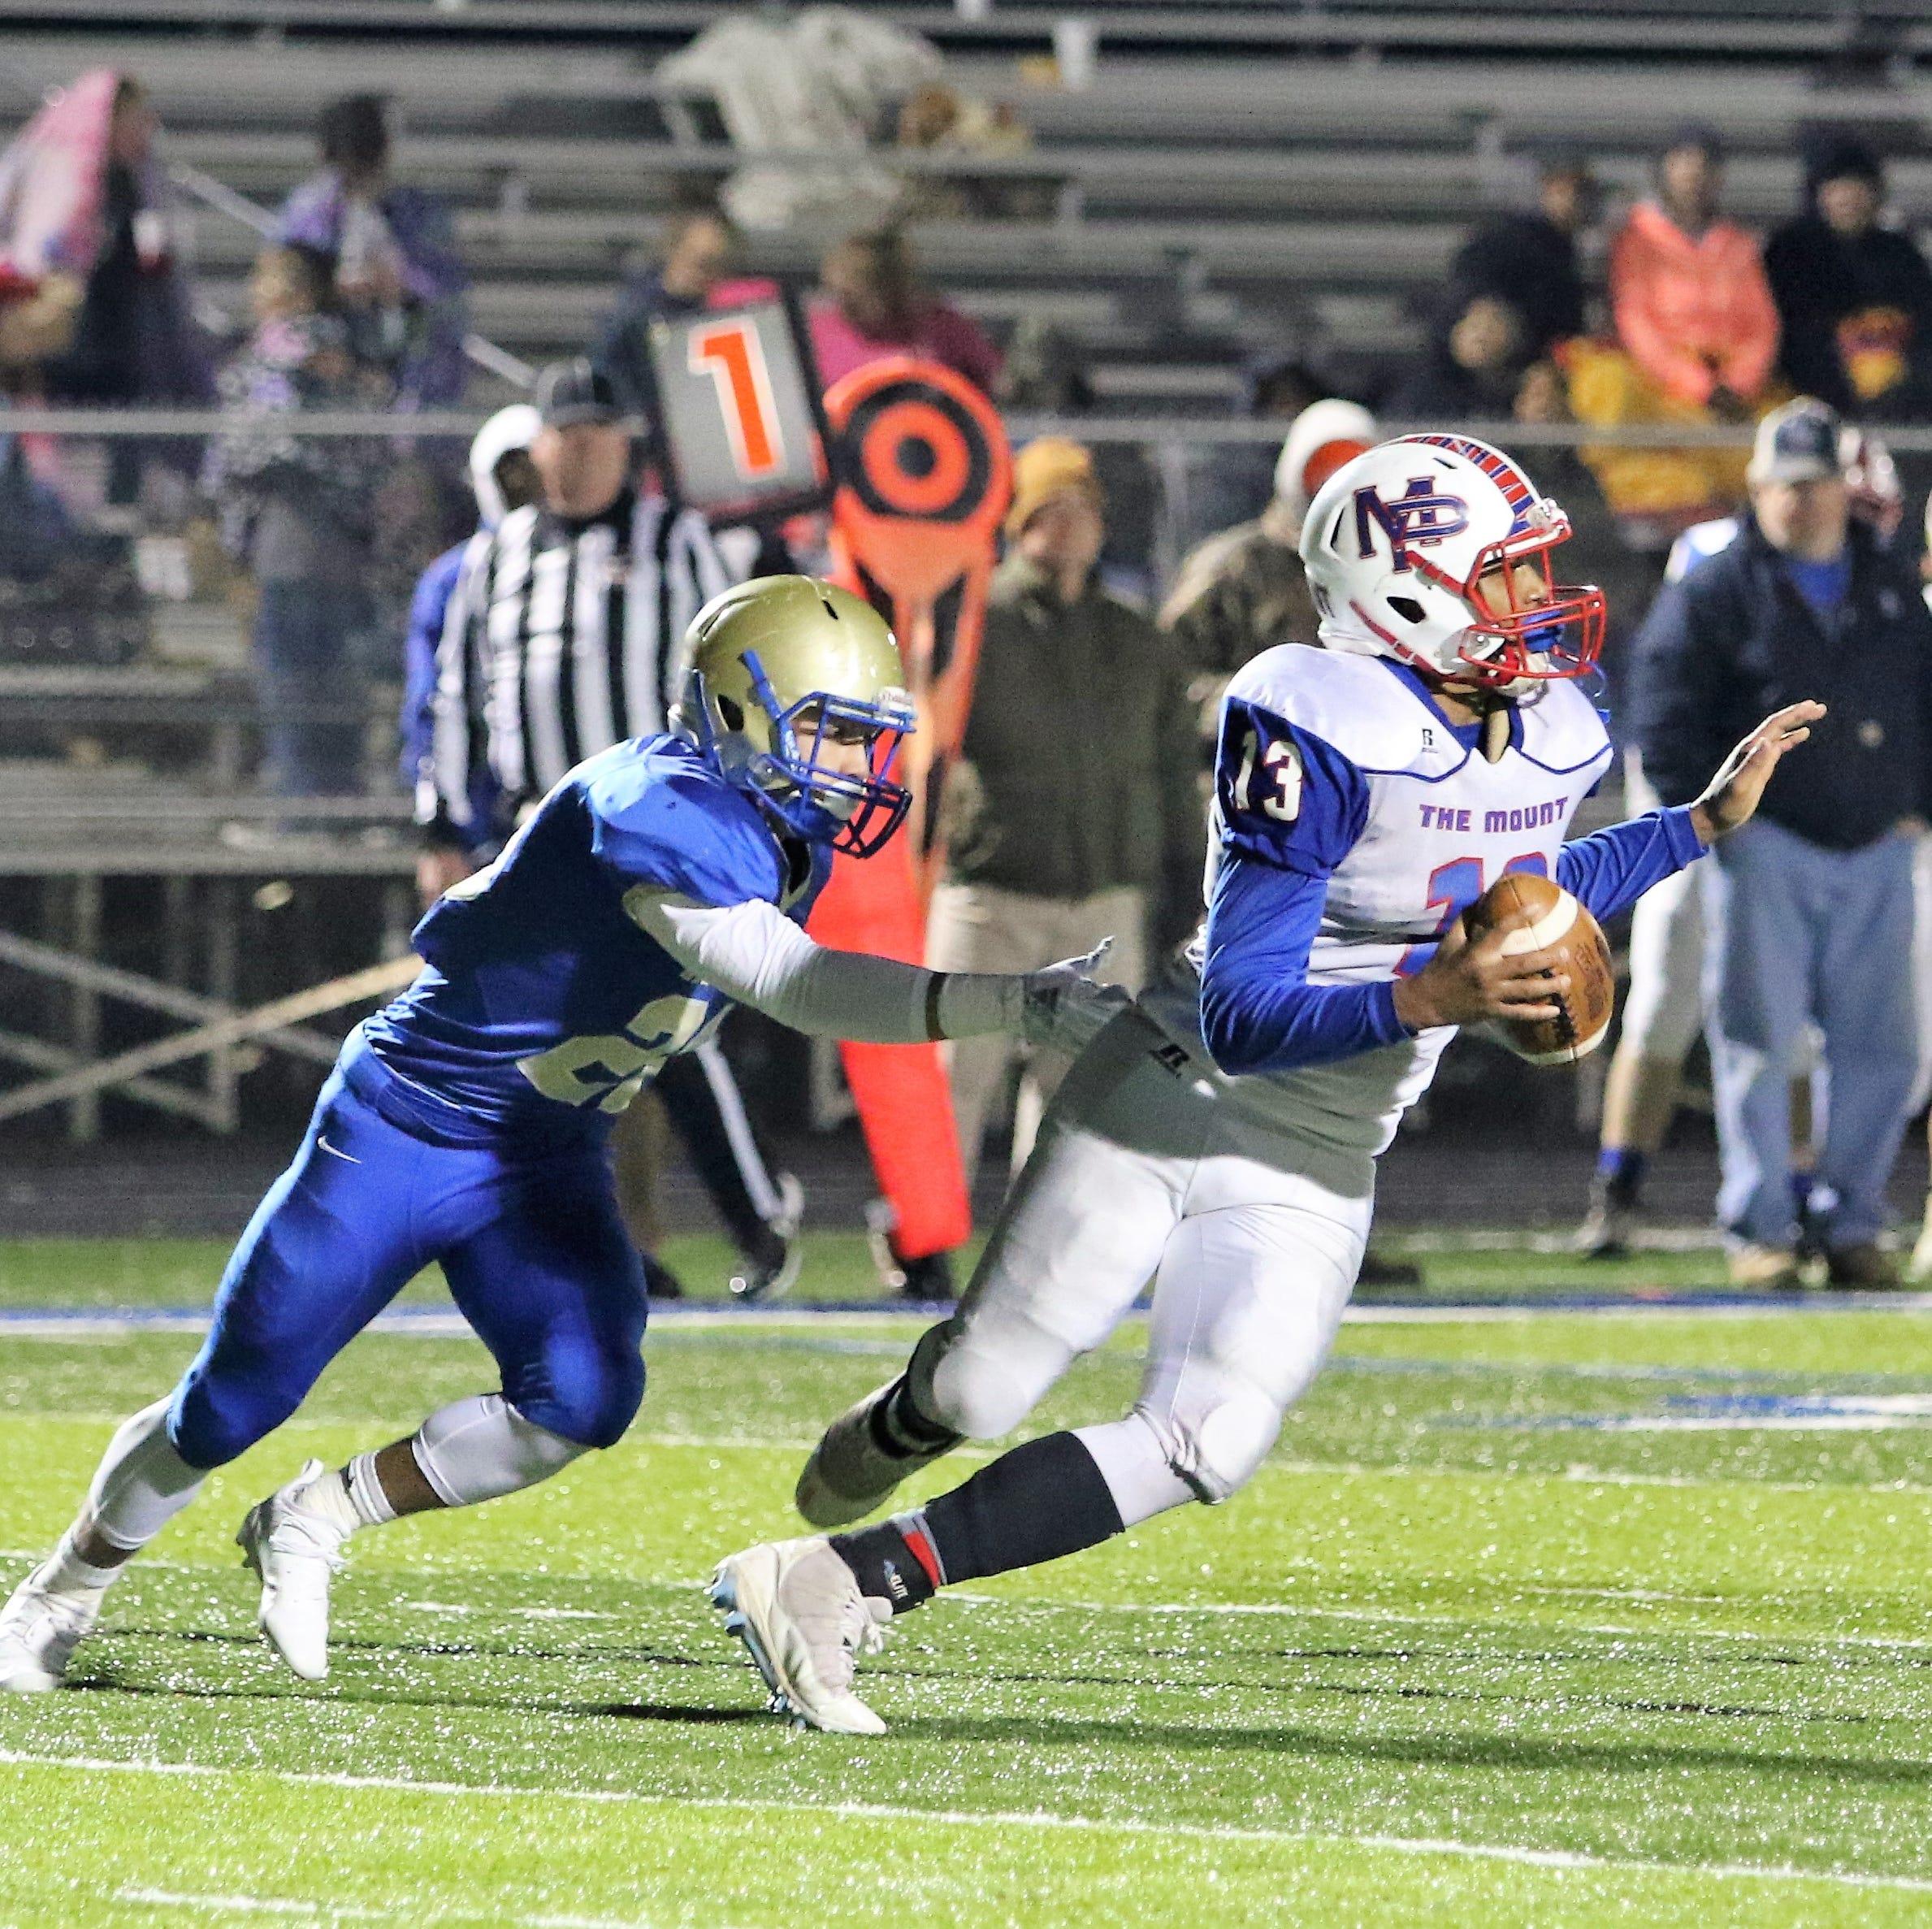 Top 10 returning Jackson area high school football linebackers for 2019